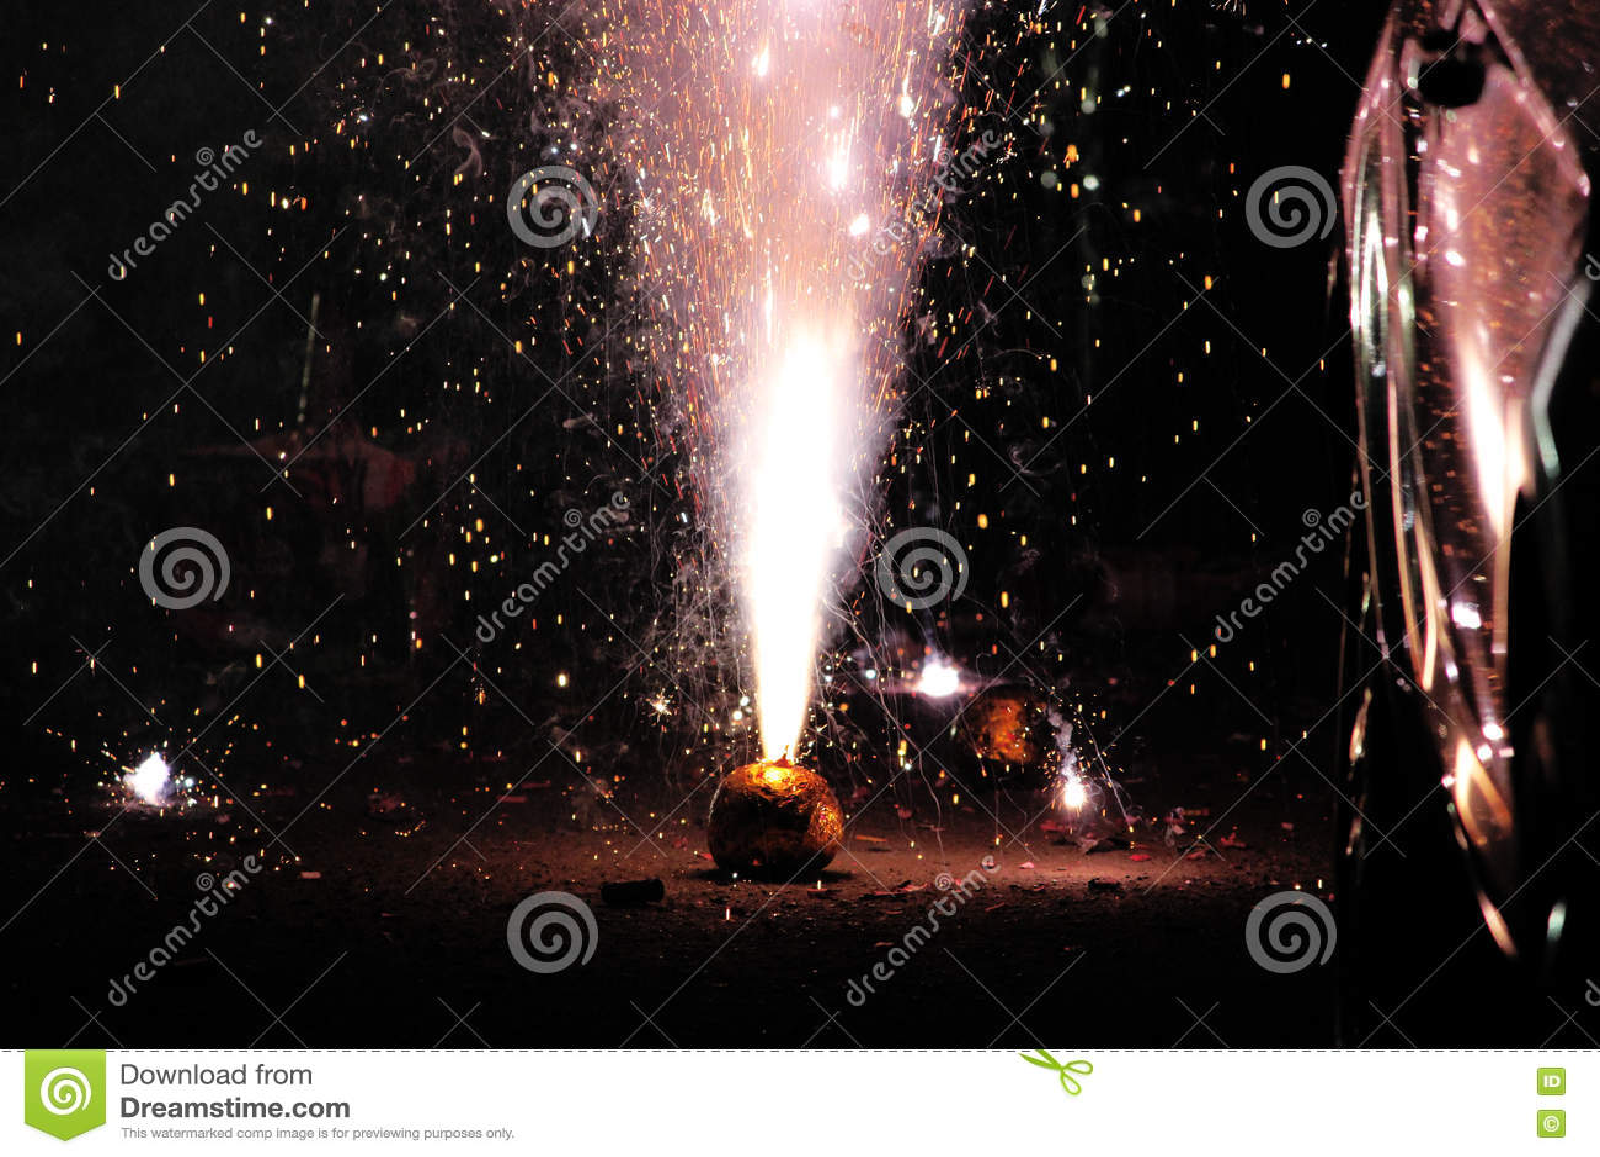 Fogos-de-artifício ou foguetes durante o festival de Diwali ou de Natal